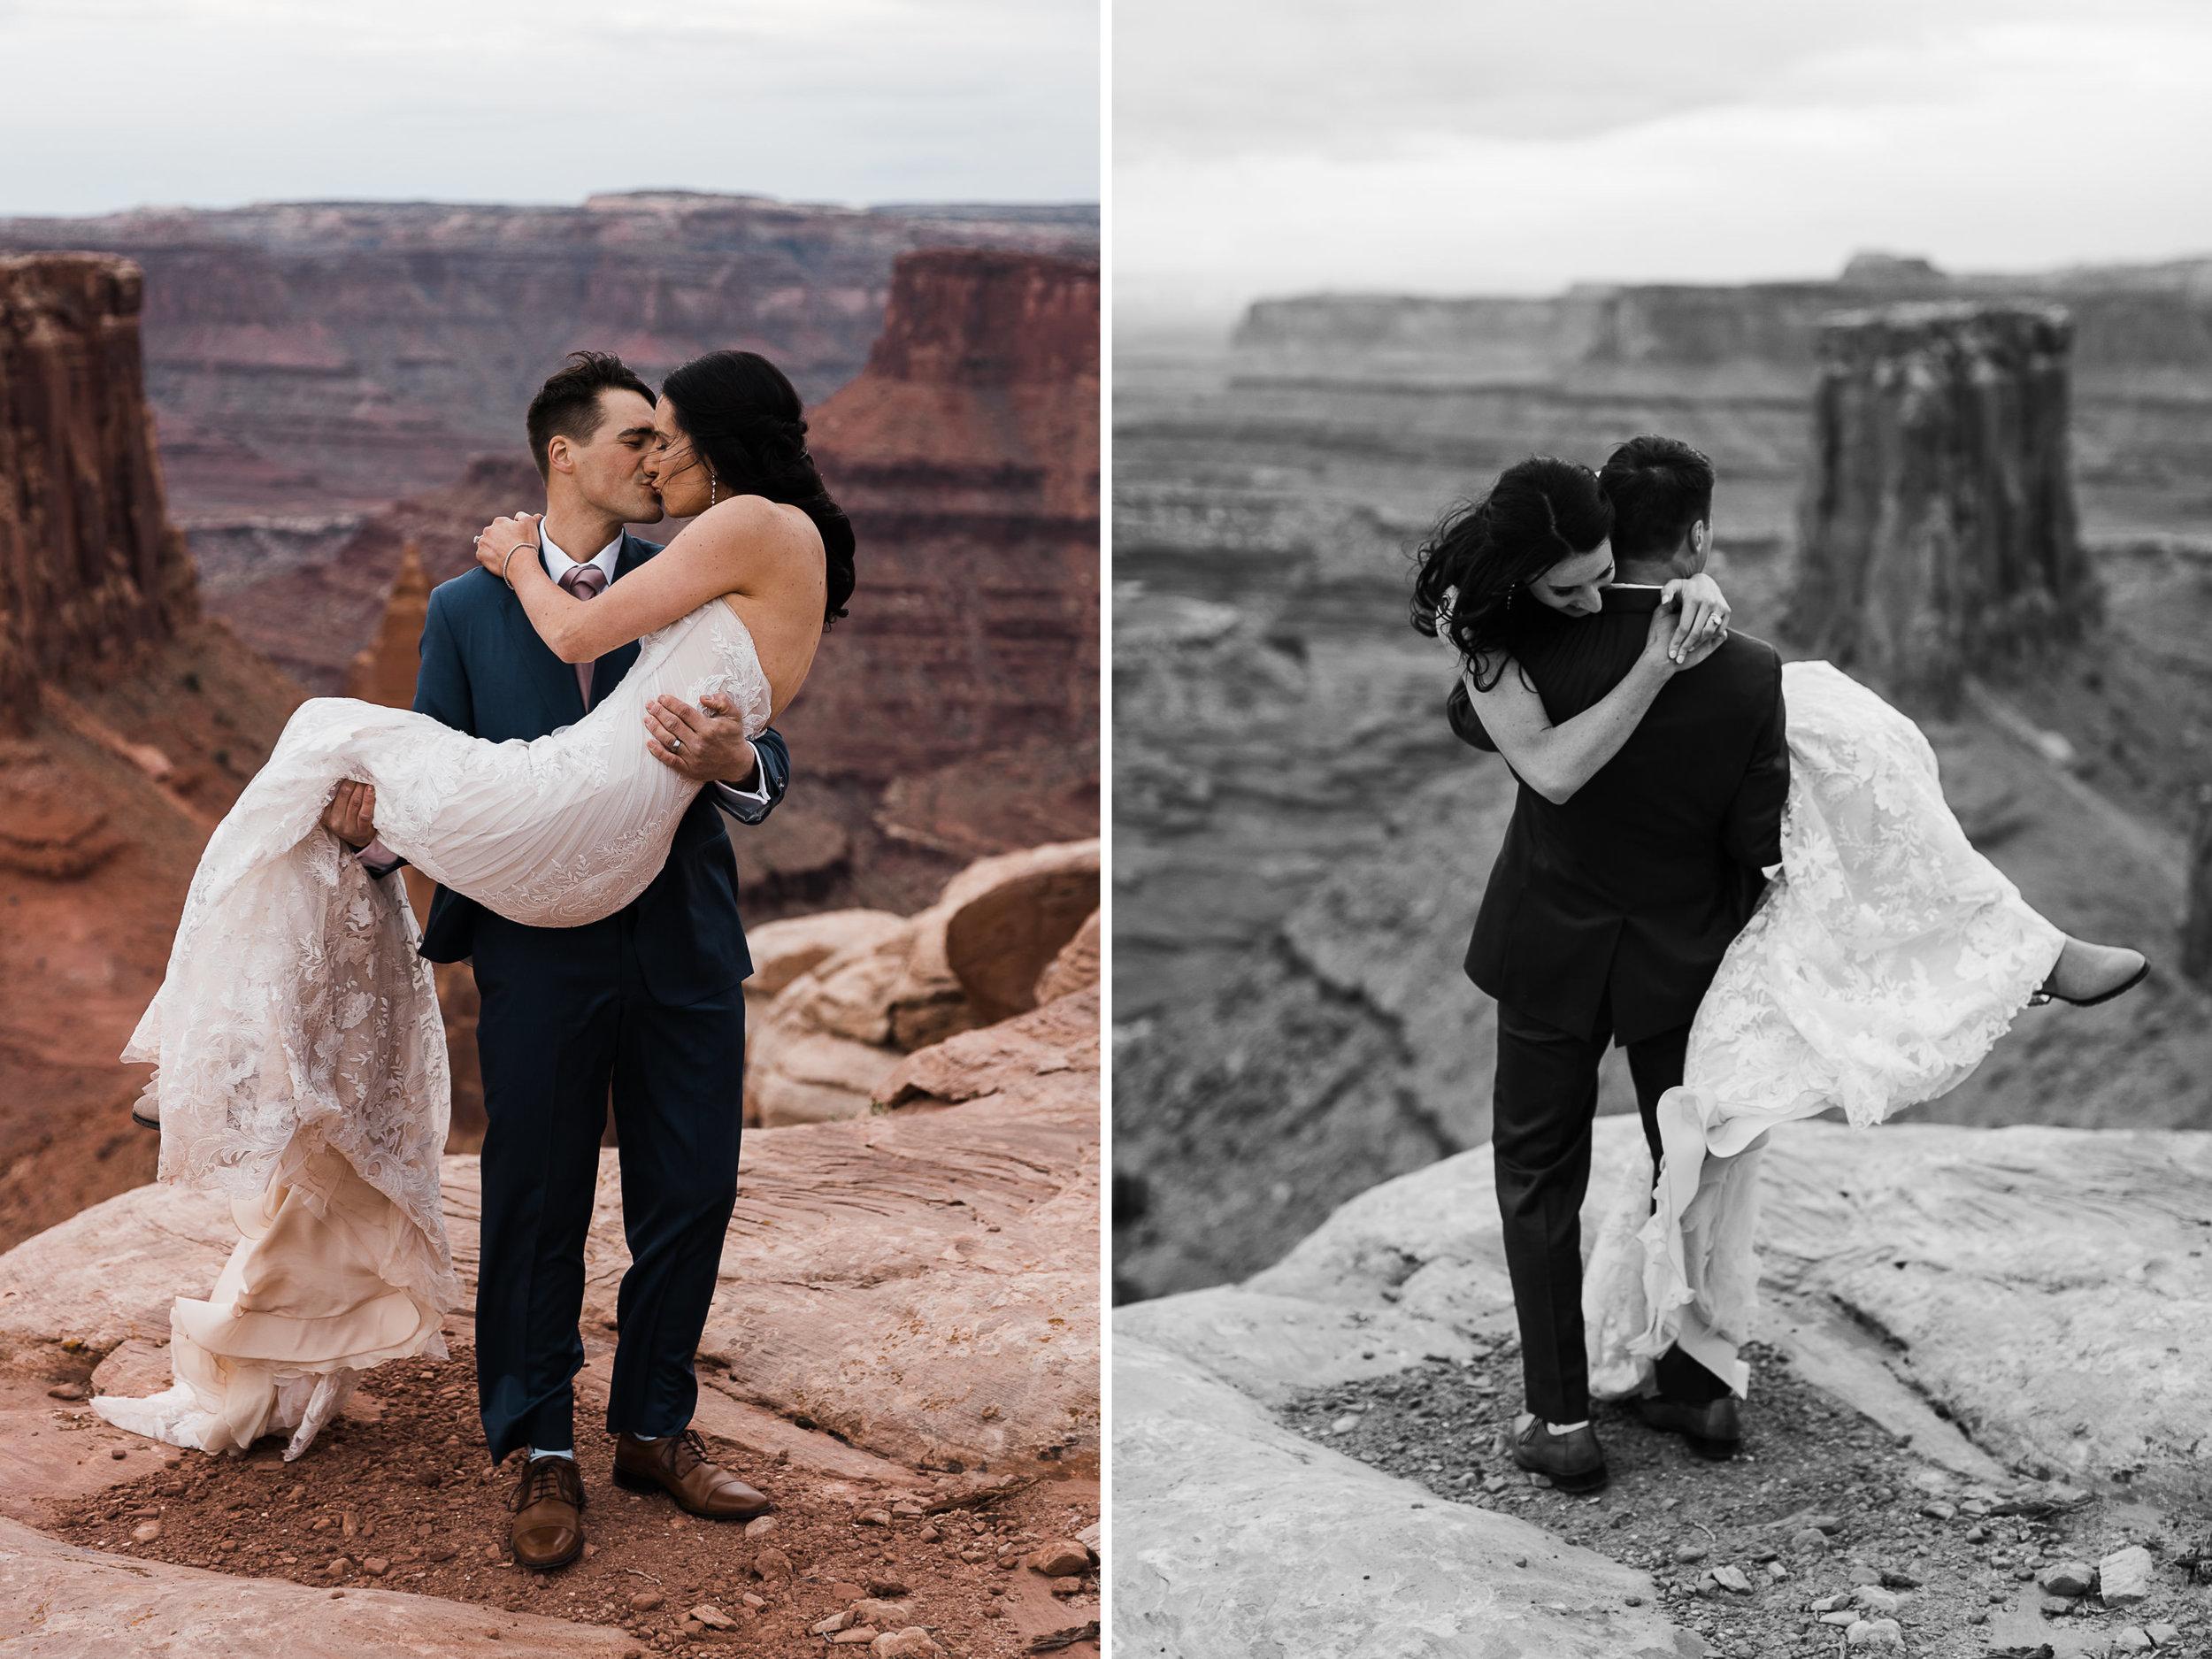 Jeep-Wedding-Moab-Utah-Hearnes-Adventure-Elopement-Photography-51.jpg